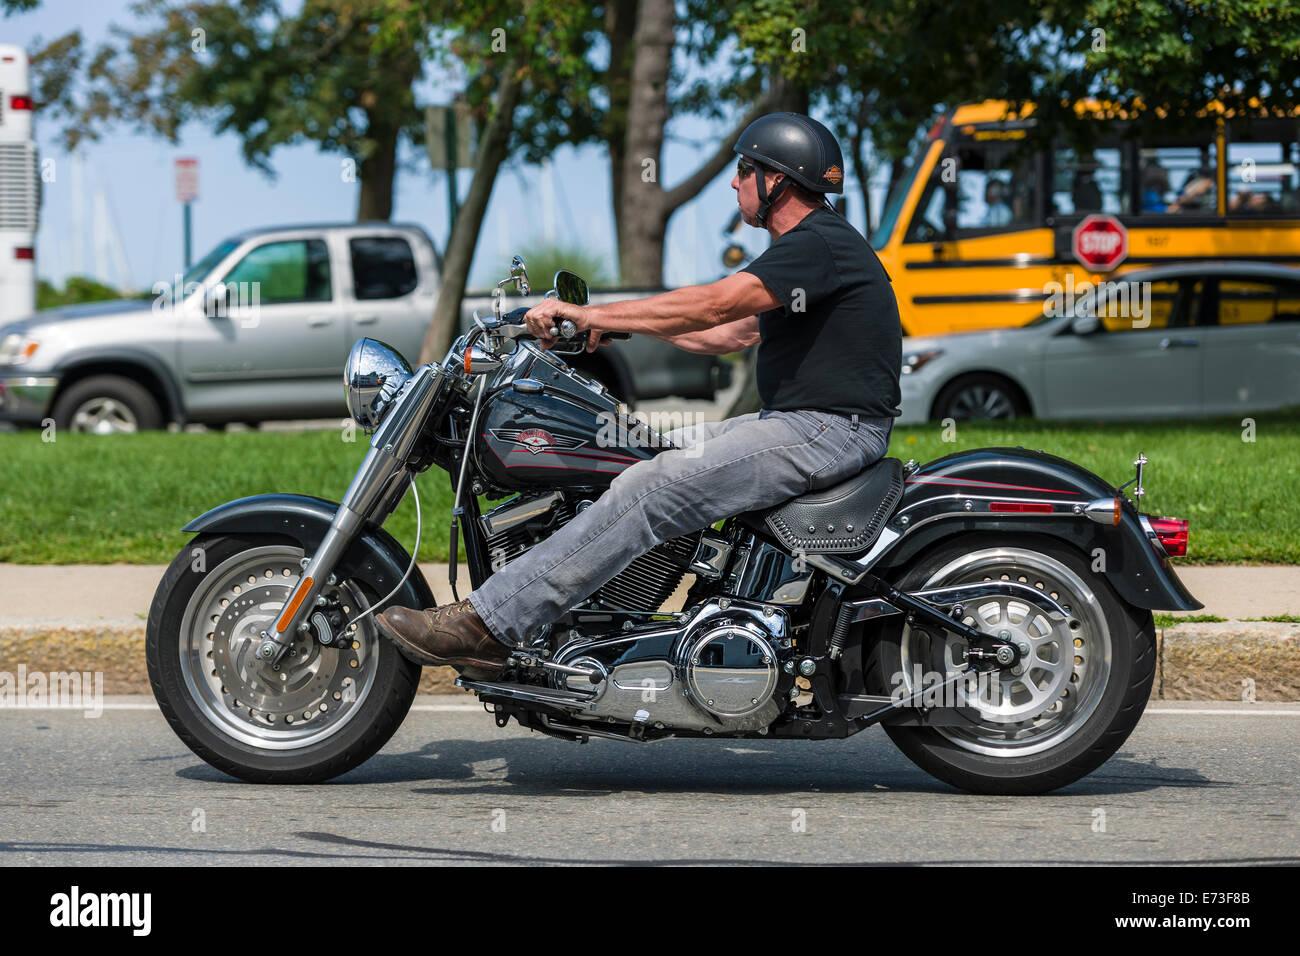 harley davidson rider stock photo 73221915 alamy. Black Bedroom Furniture Sets. Home Design Ideas